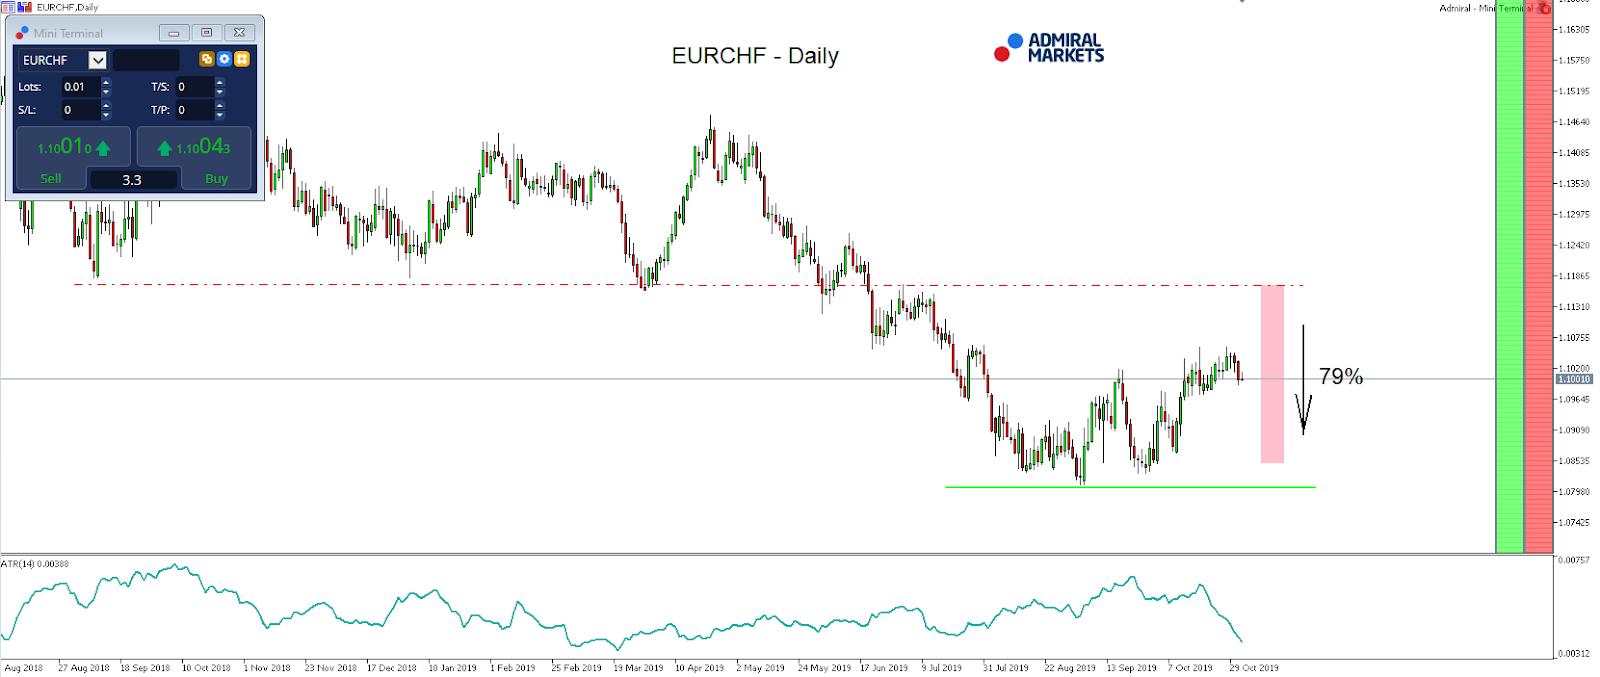 EURCHF Daily chart